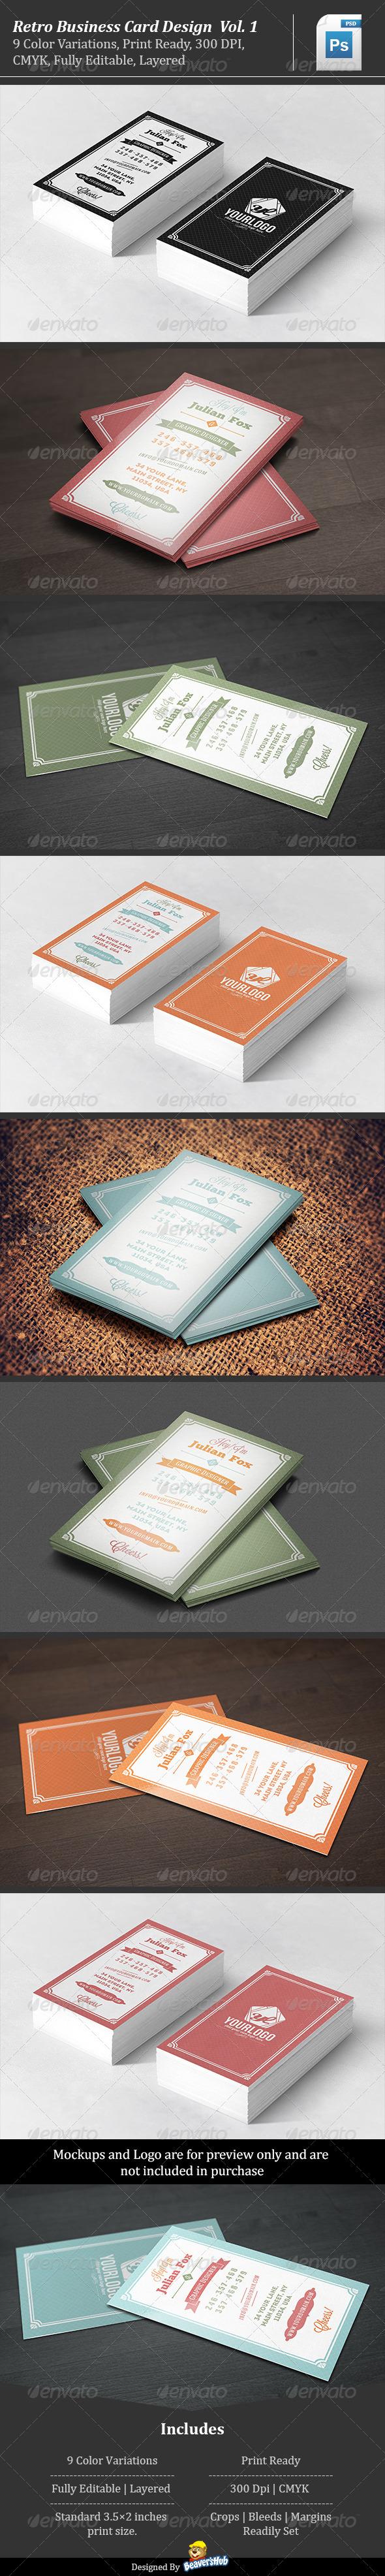 GraphicRiver Retro Business Card Design Vol 1 5550437